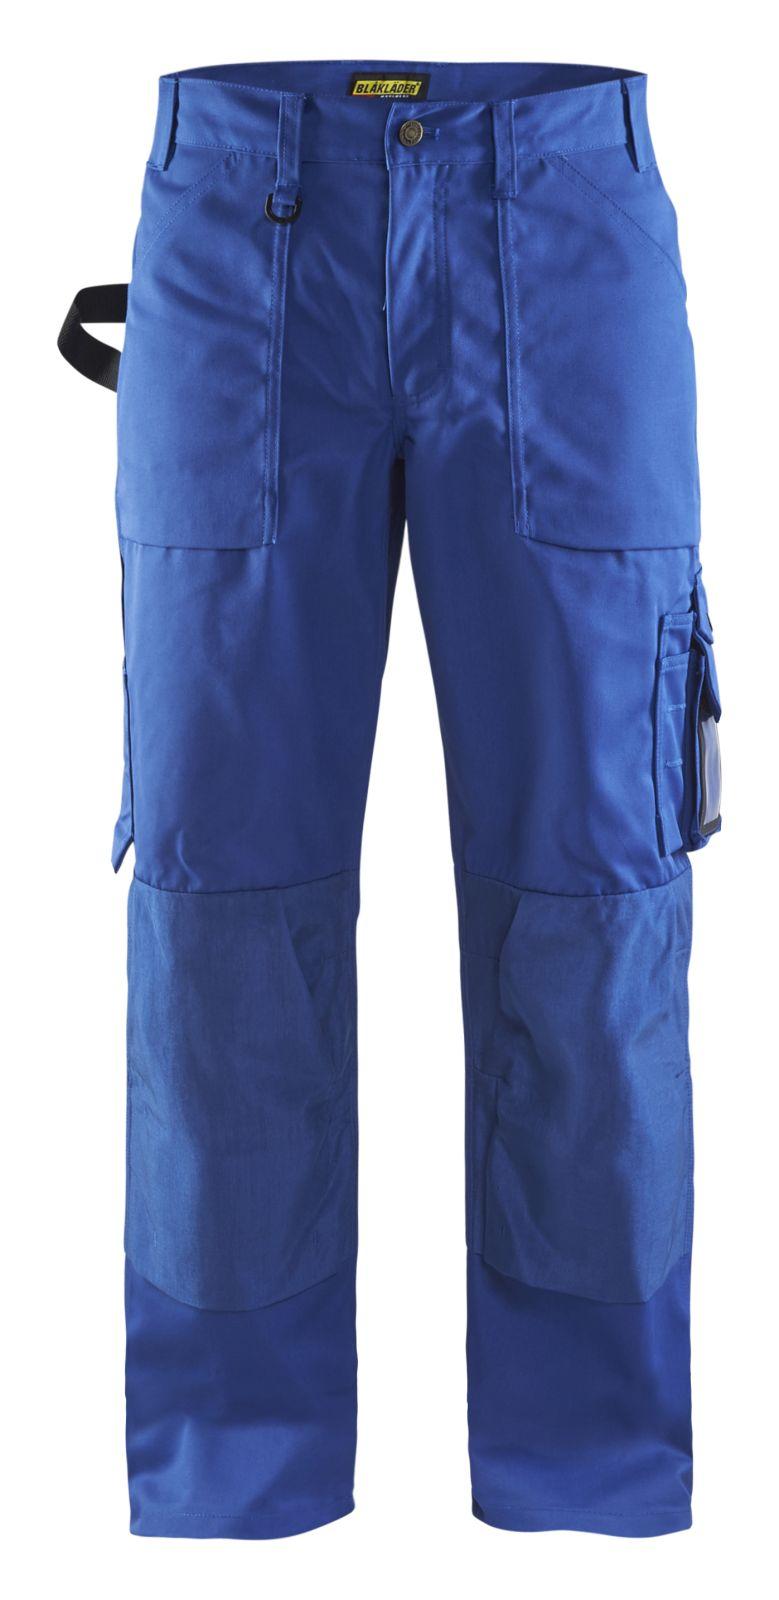 Blaklader Werkbroeken 15701860 korenblauw(8500)